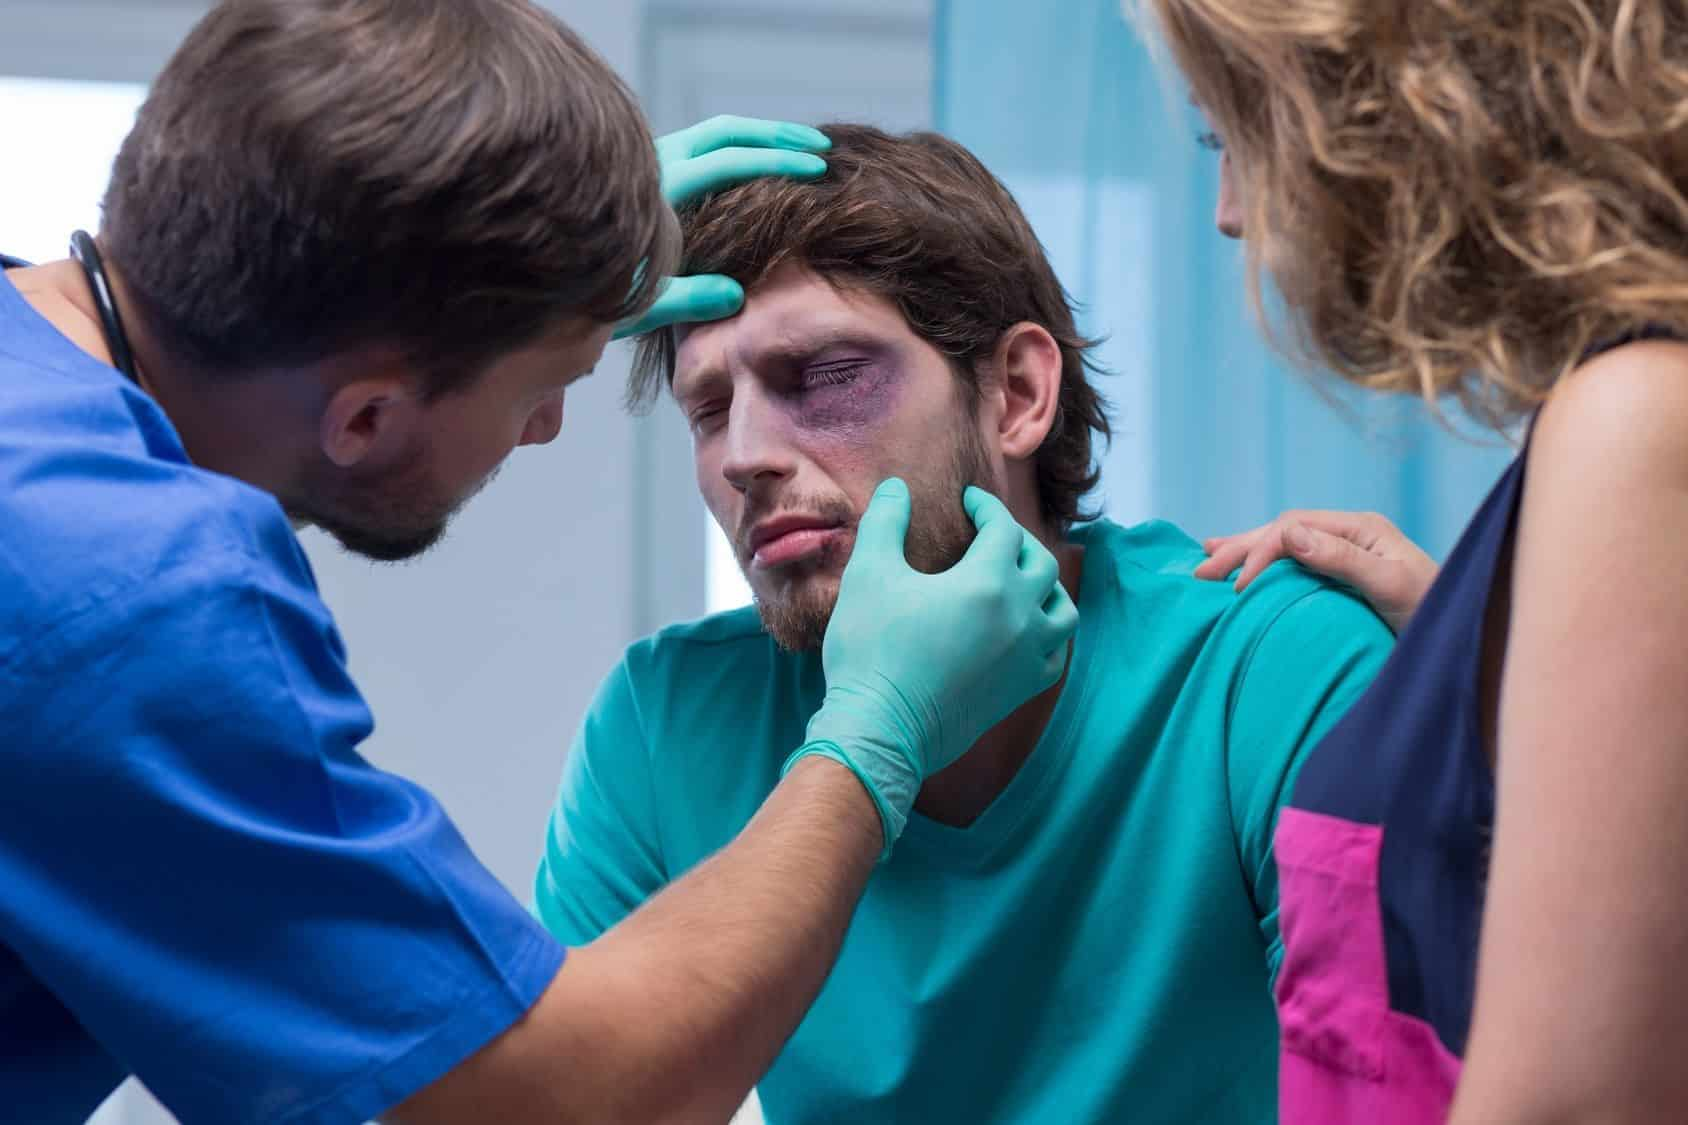 Beaten man with black eye in emergency room